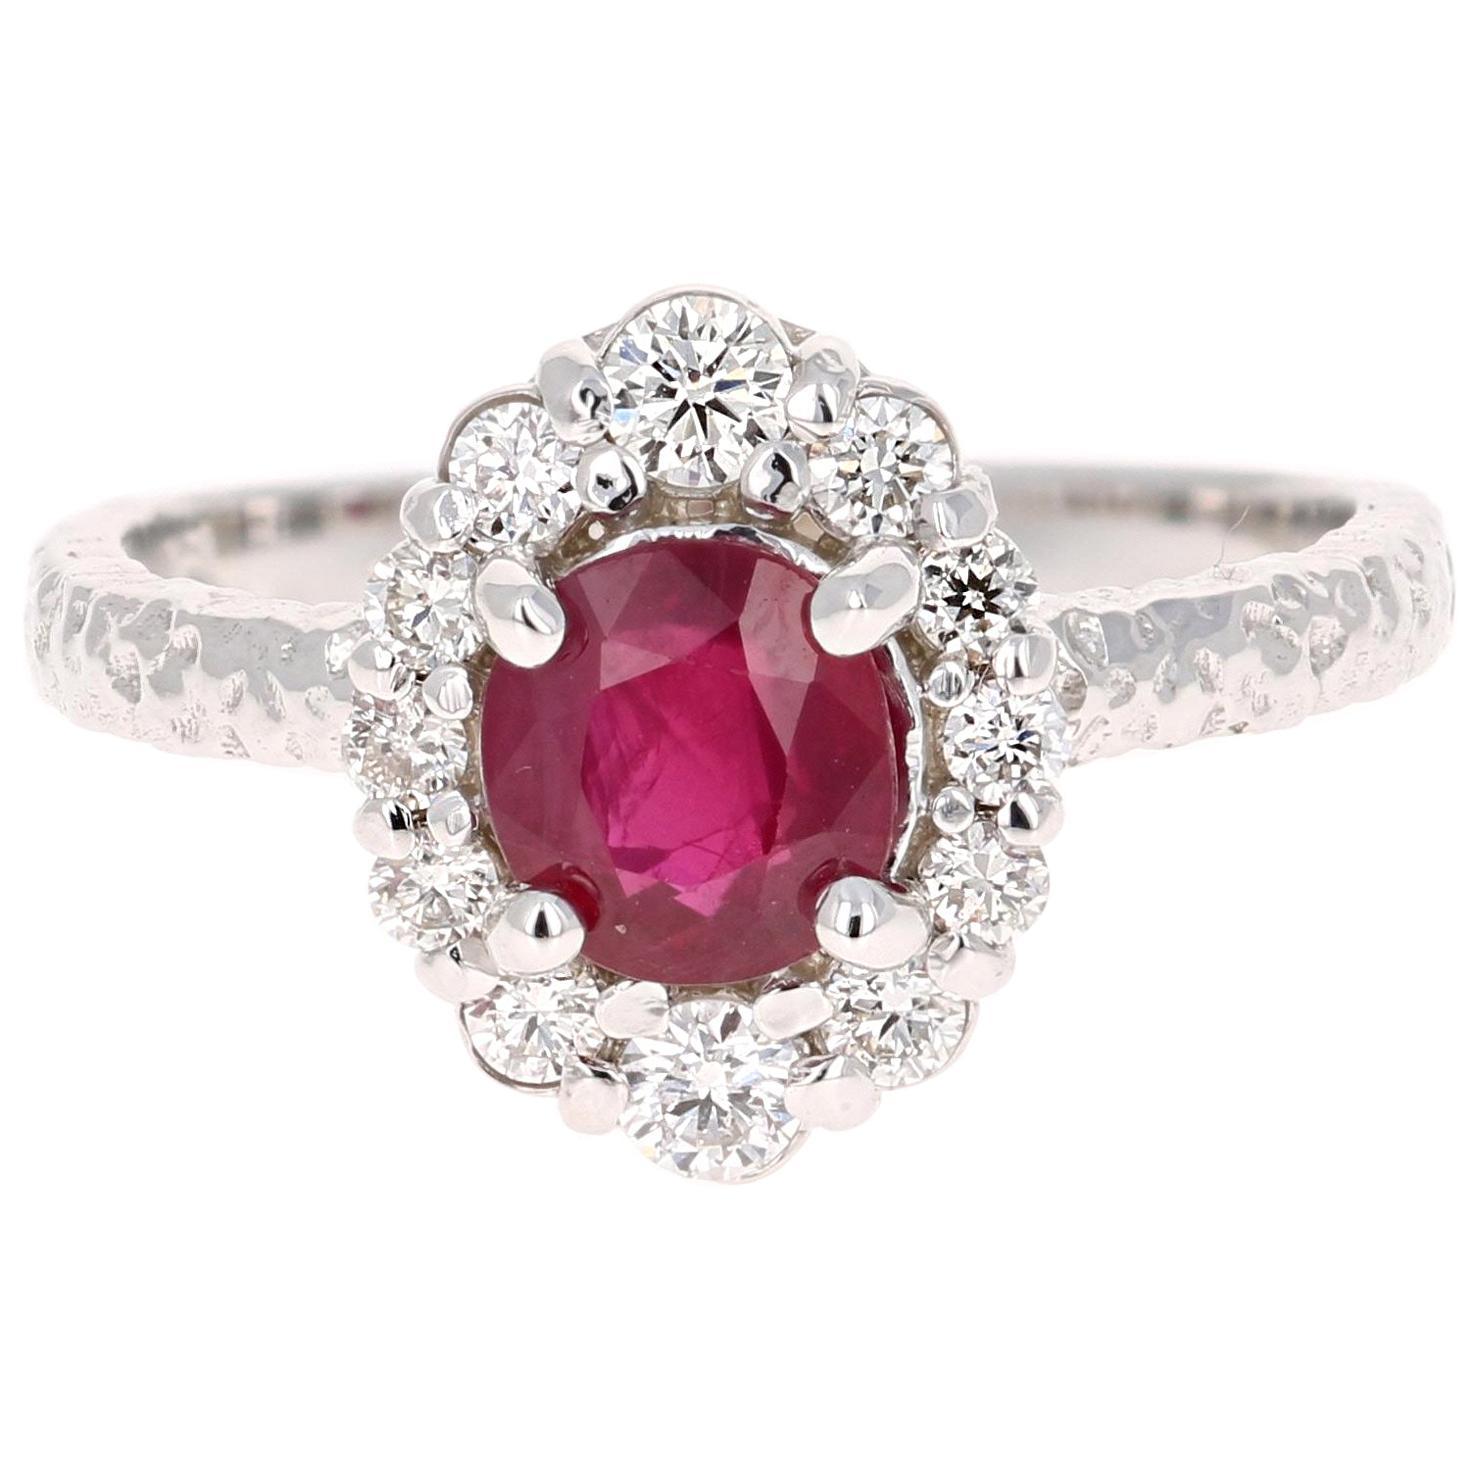 1.46 Carat Oval Cut Burmese Ruby Diamond 14 Karat White Gold Bridal Ring